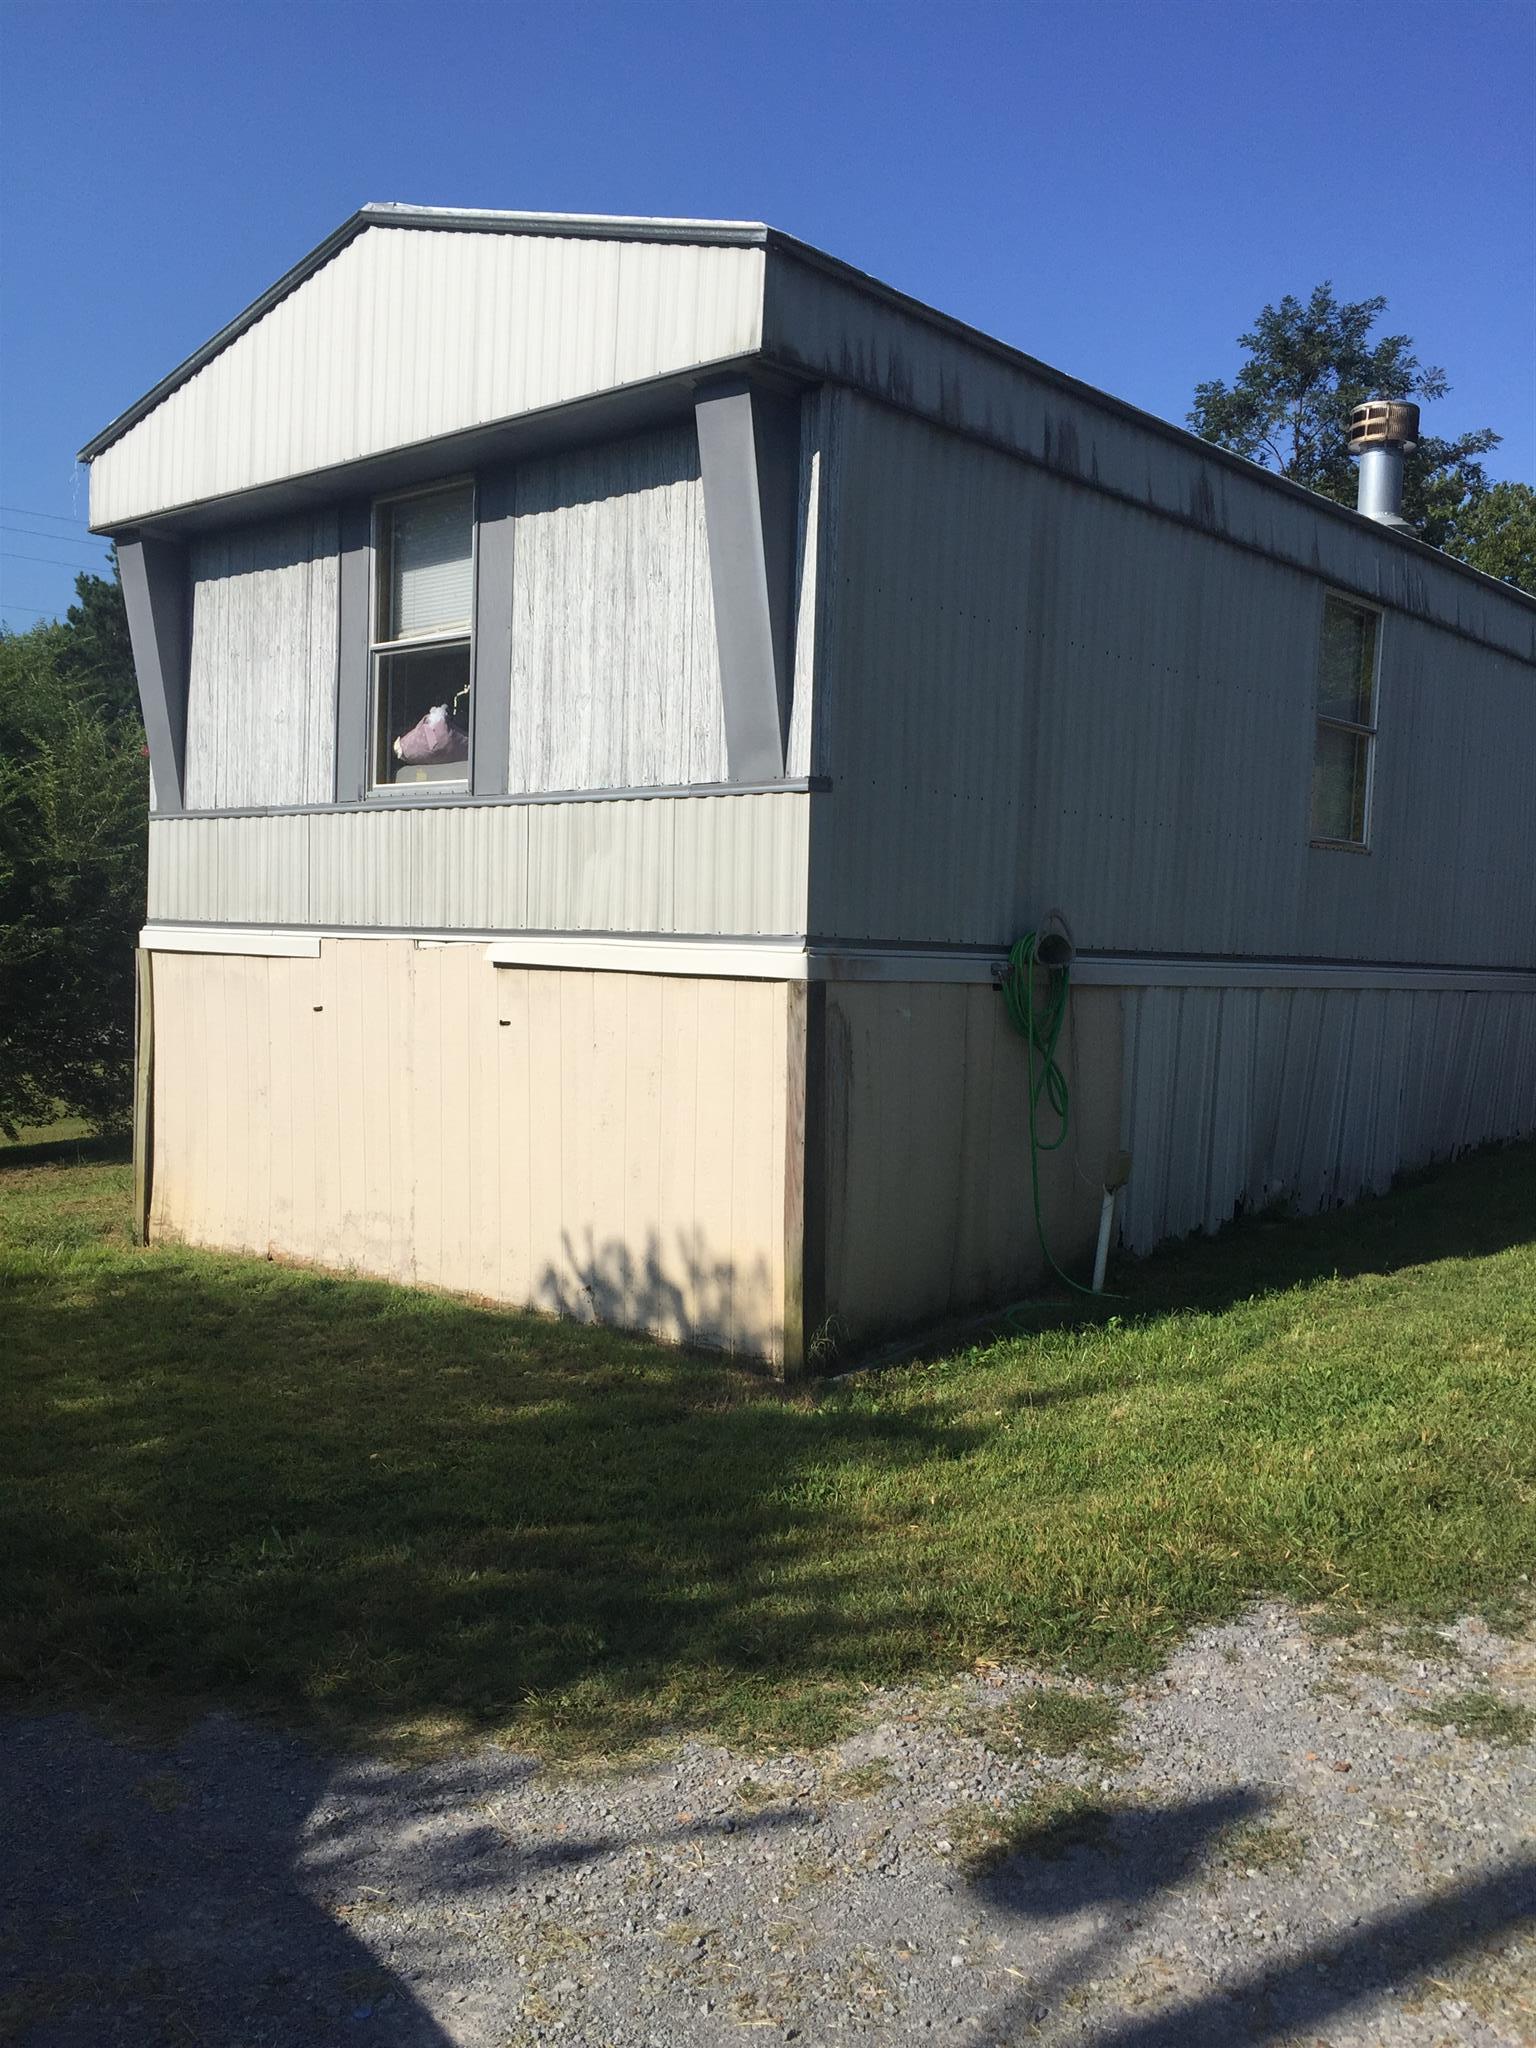 389 Arnold road, Shelbyville, TN 37160 - Shelbyville, TN real estate listing